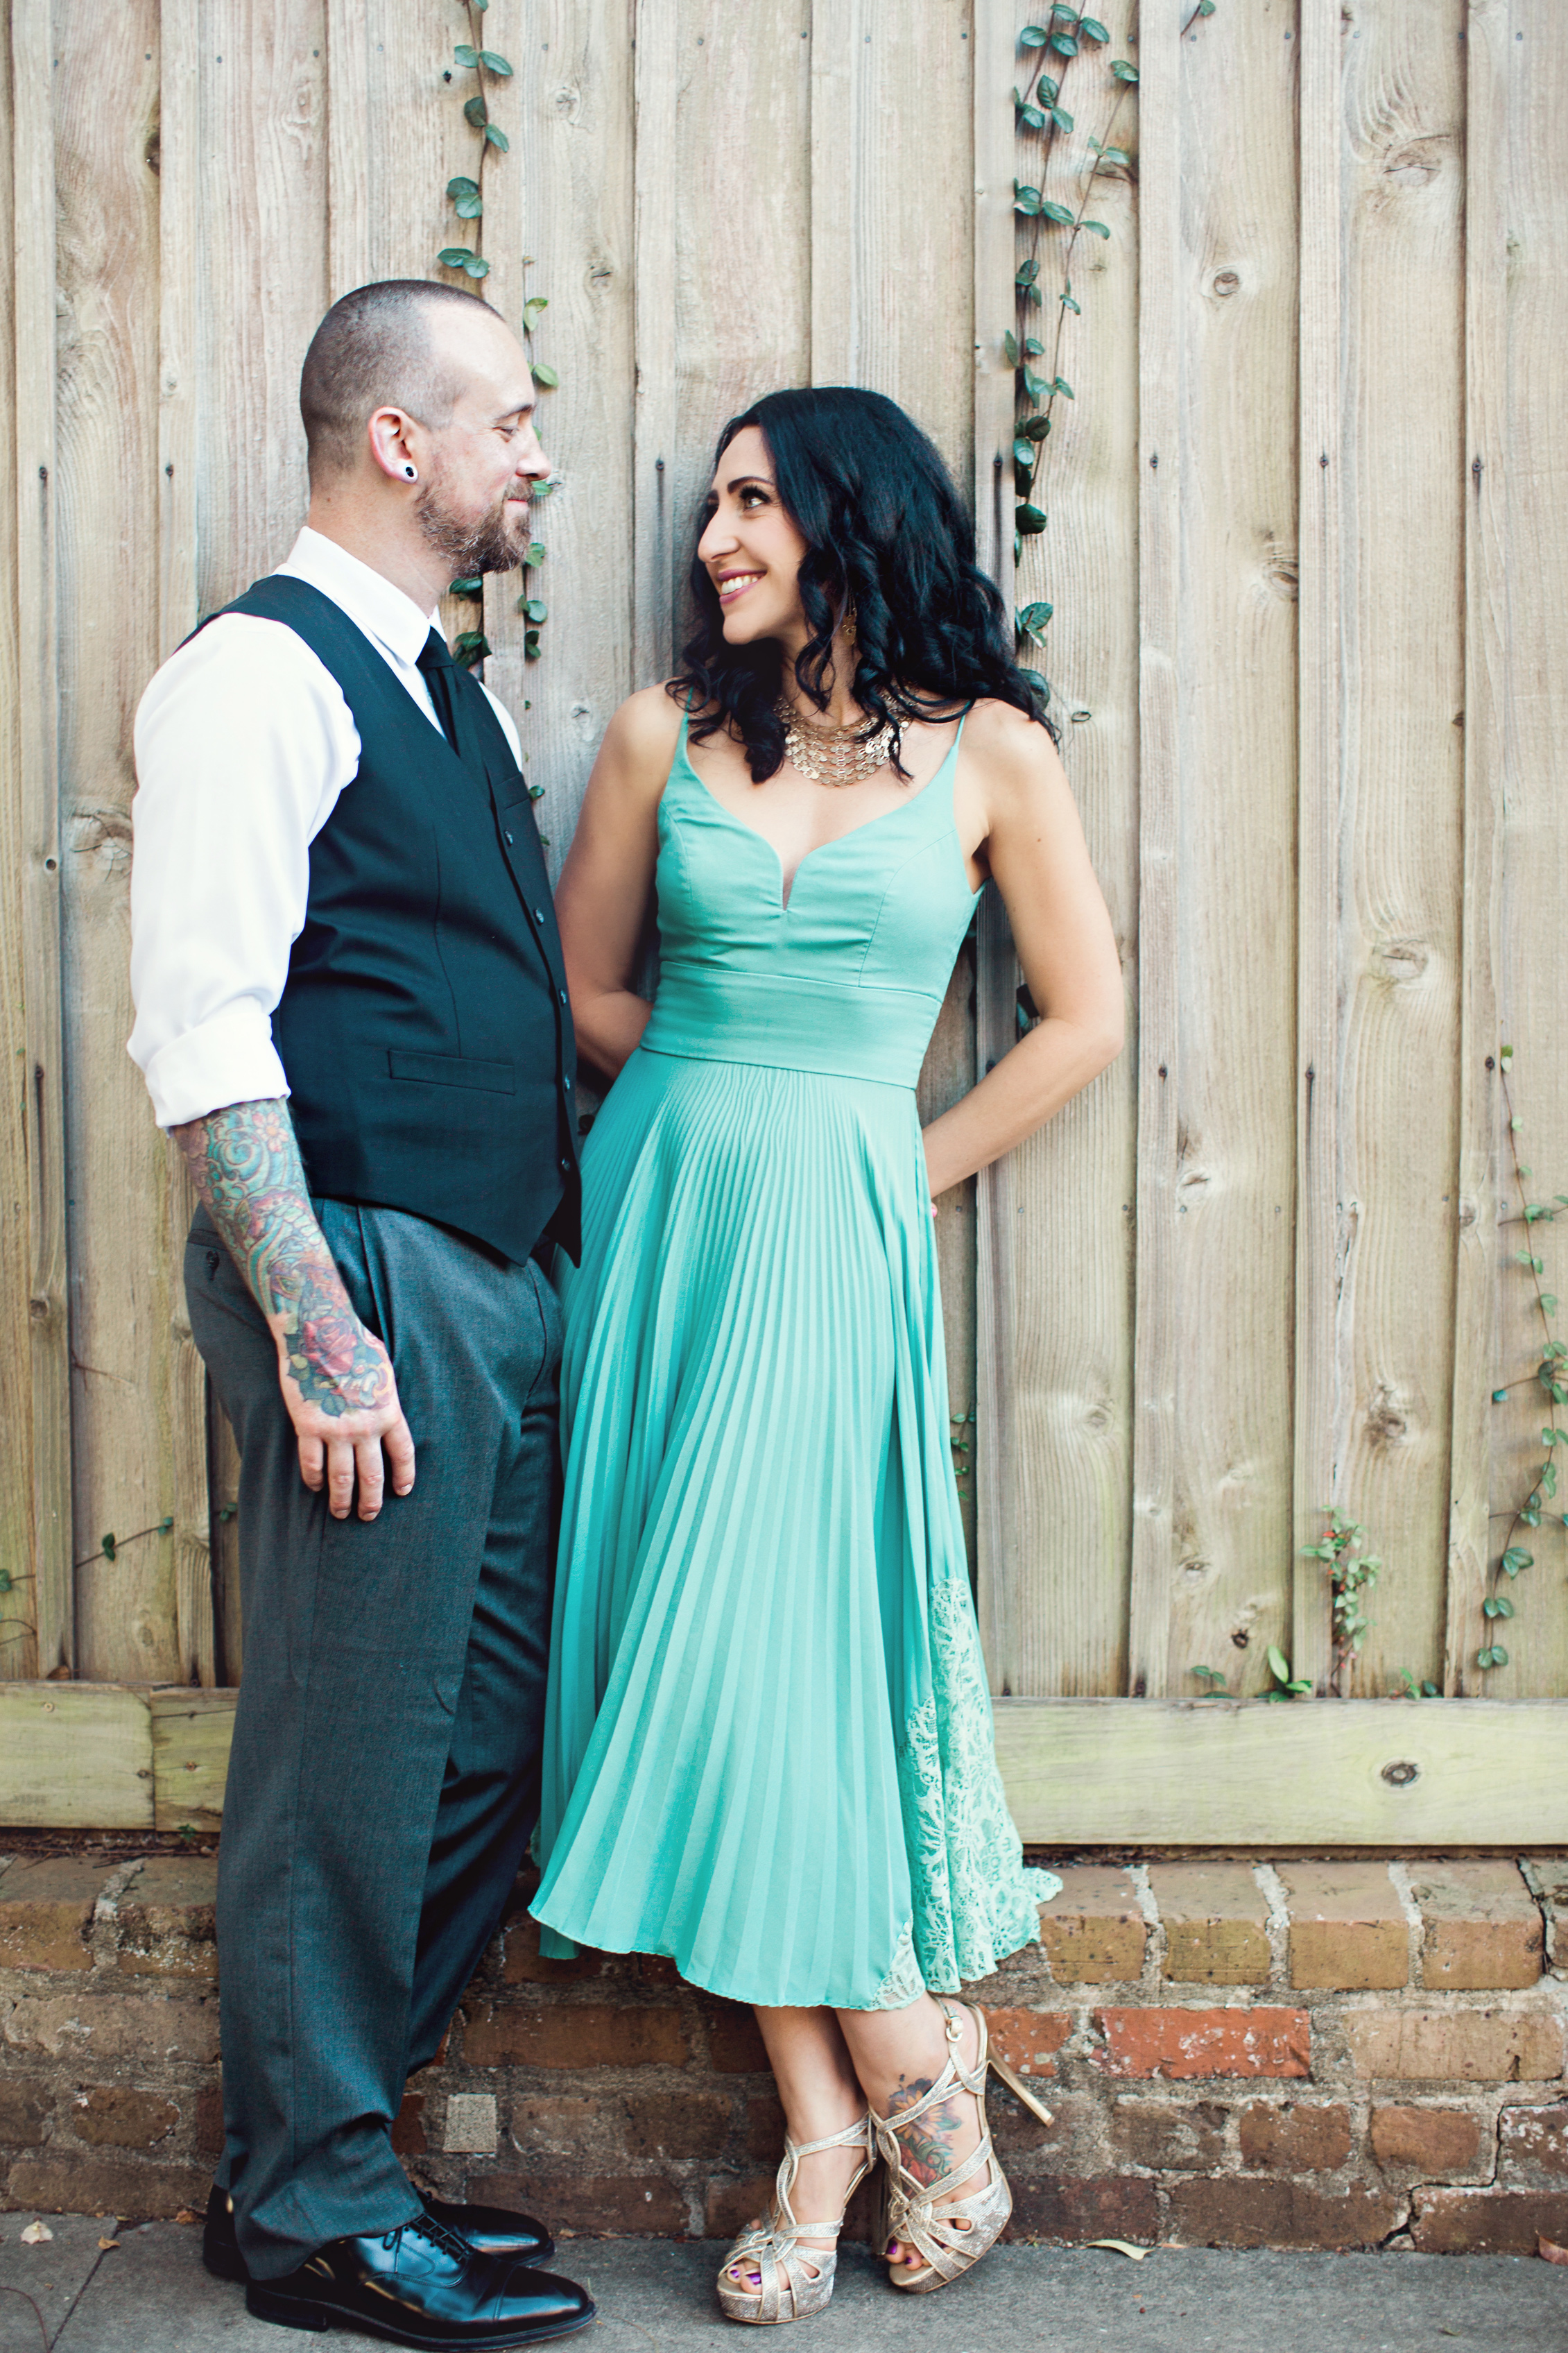 CindyGiovagnoliPhotography_Seattle_Washington_PNW_Couple_Engagement_Portrait_Photography-014.jpg